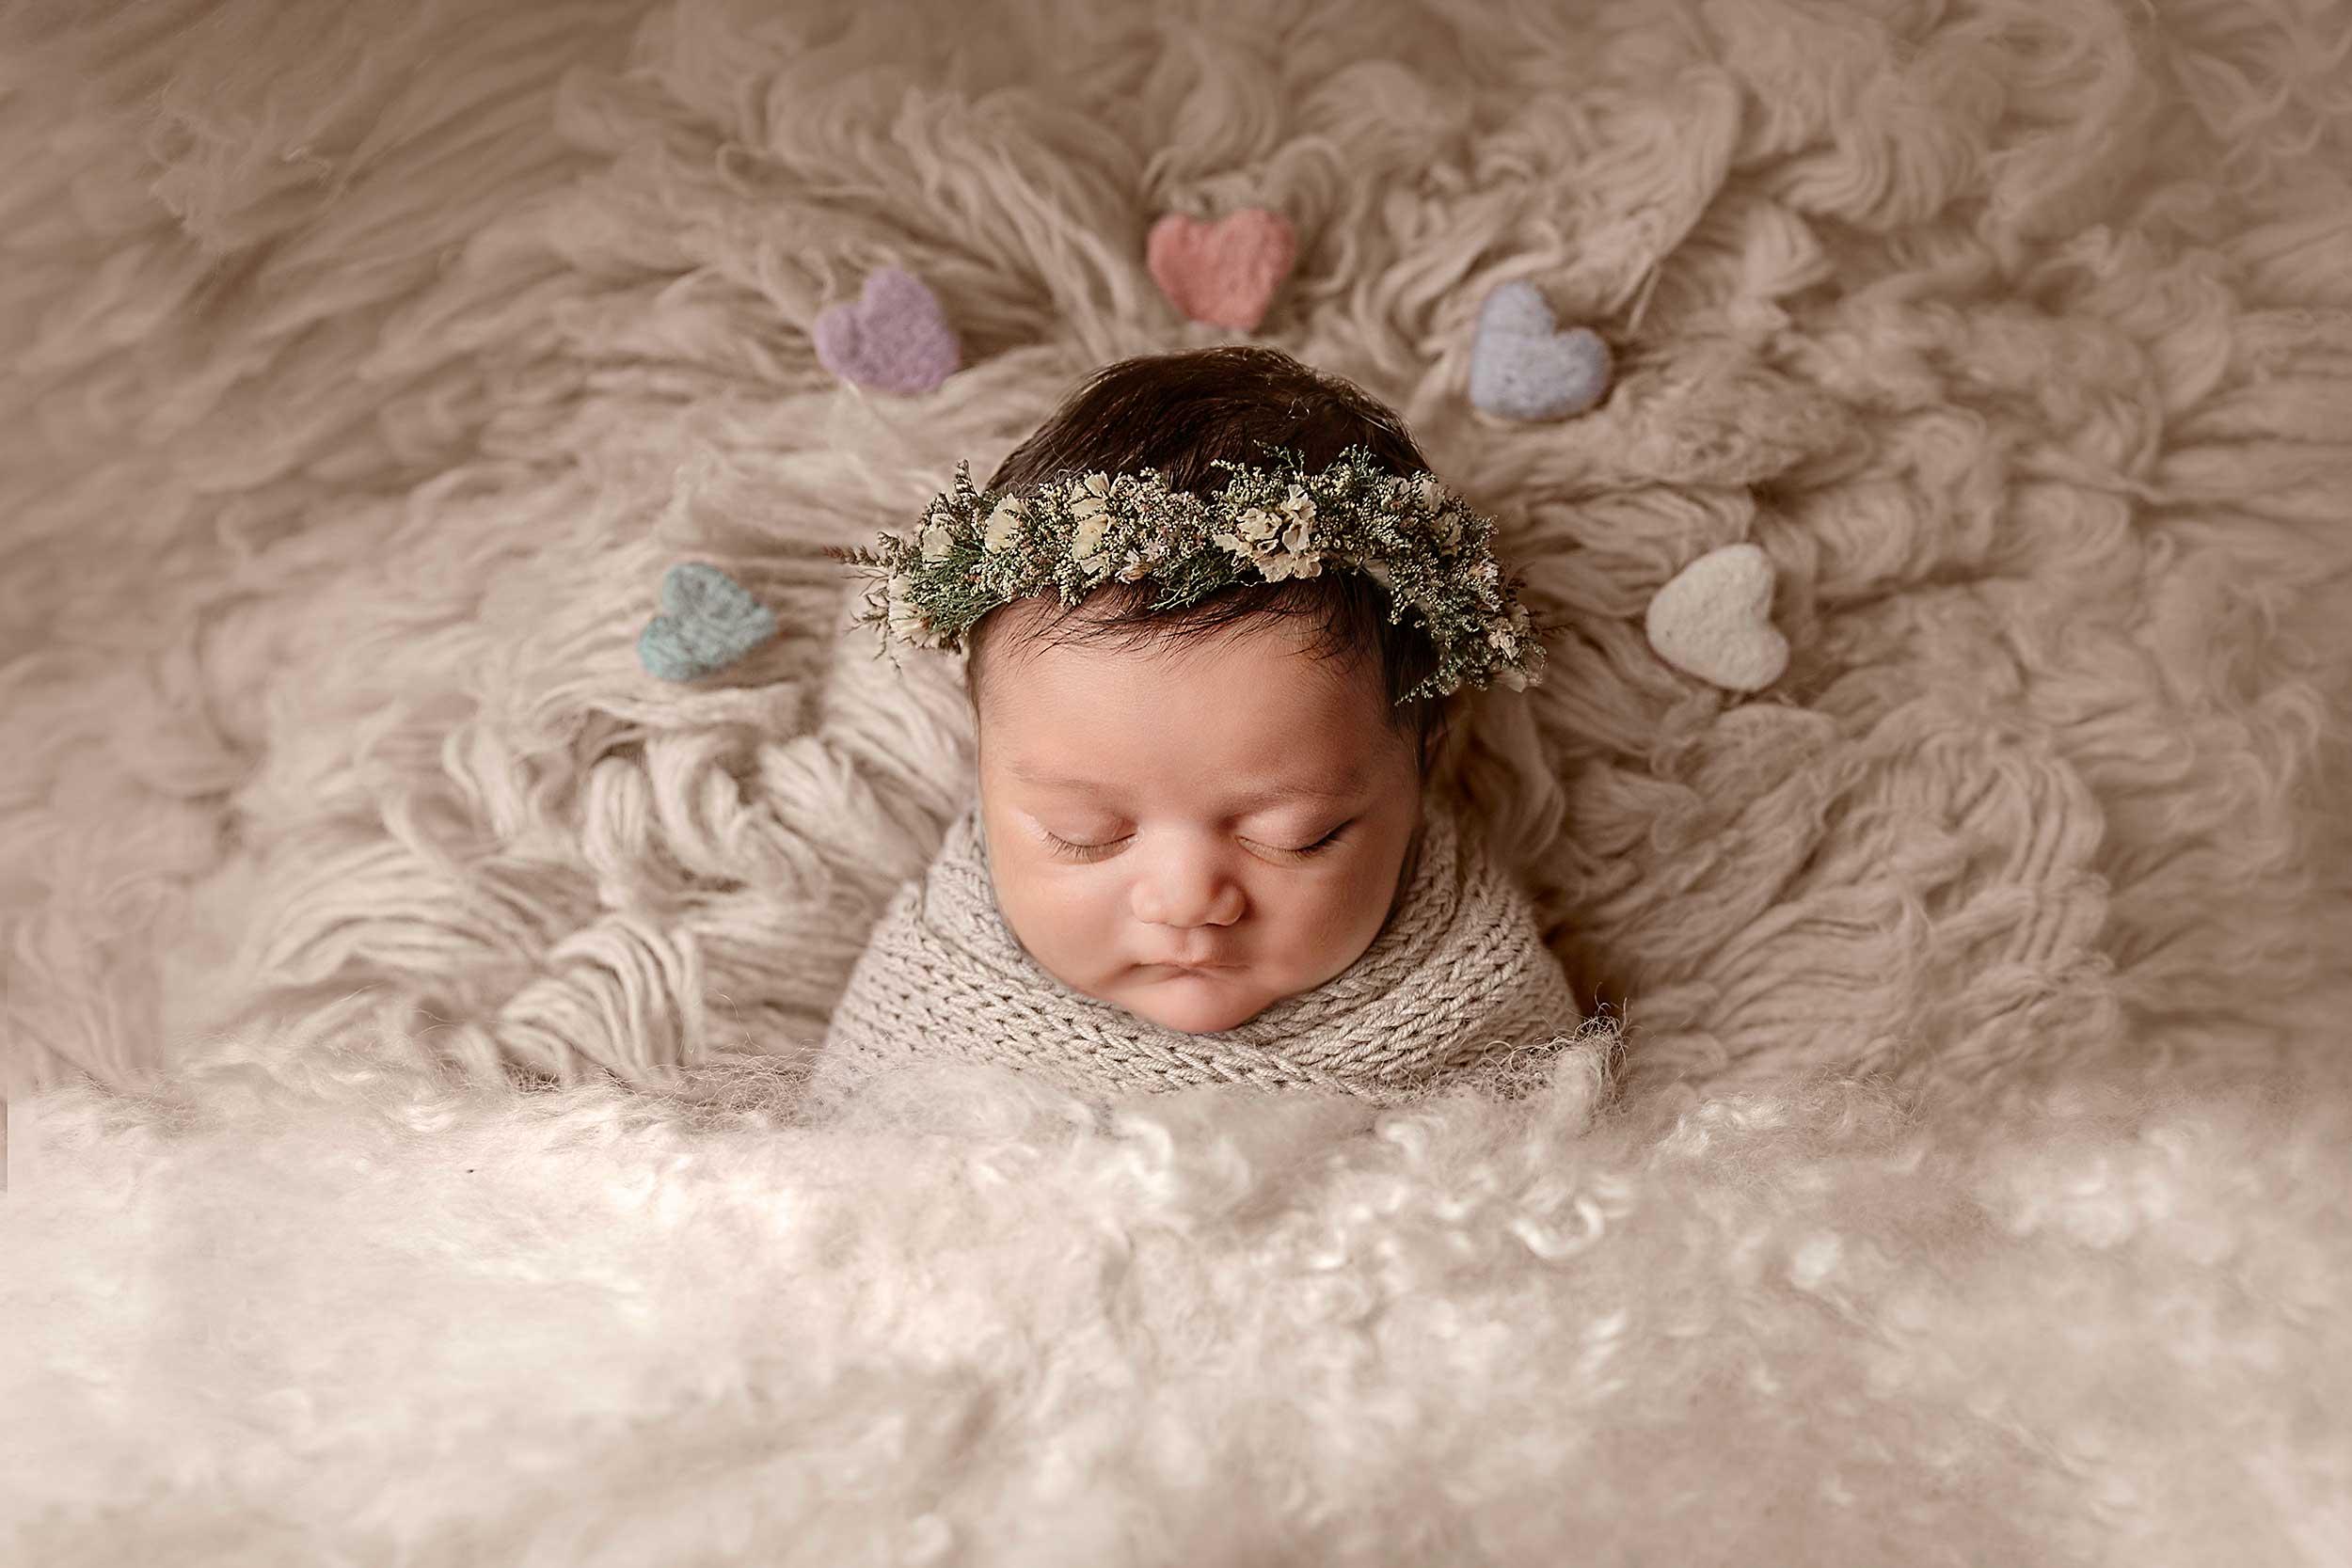 beautiful baby in fluffy blanket